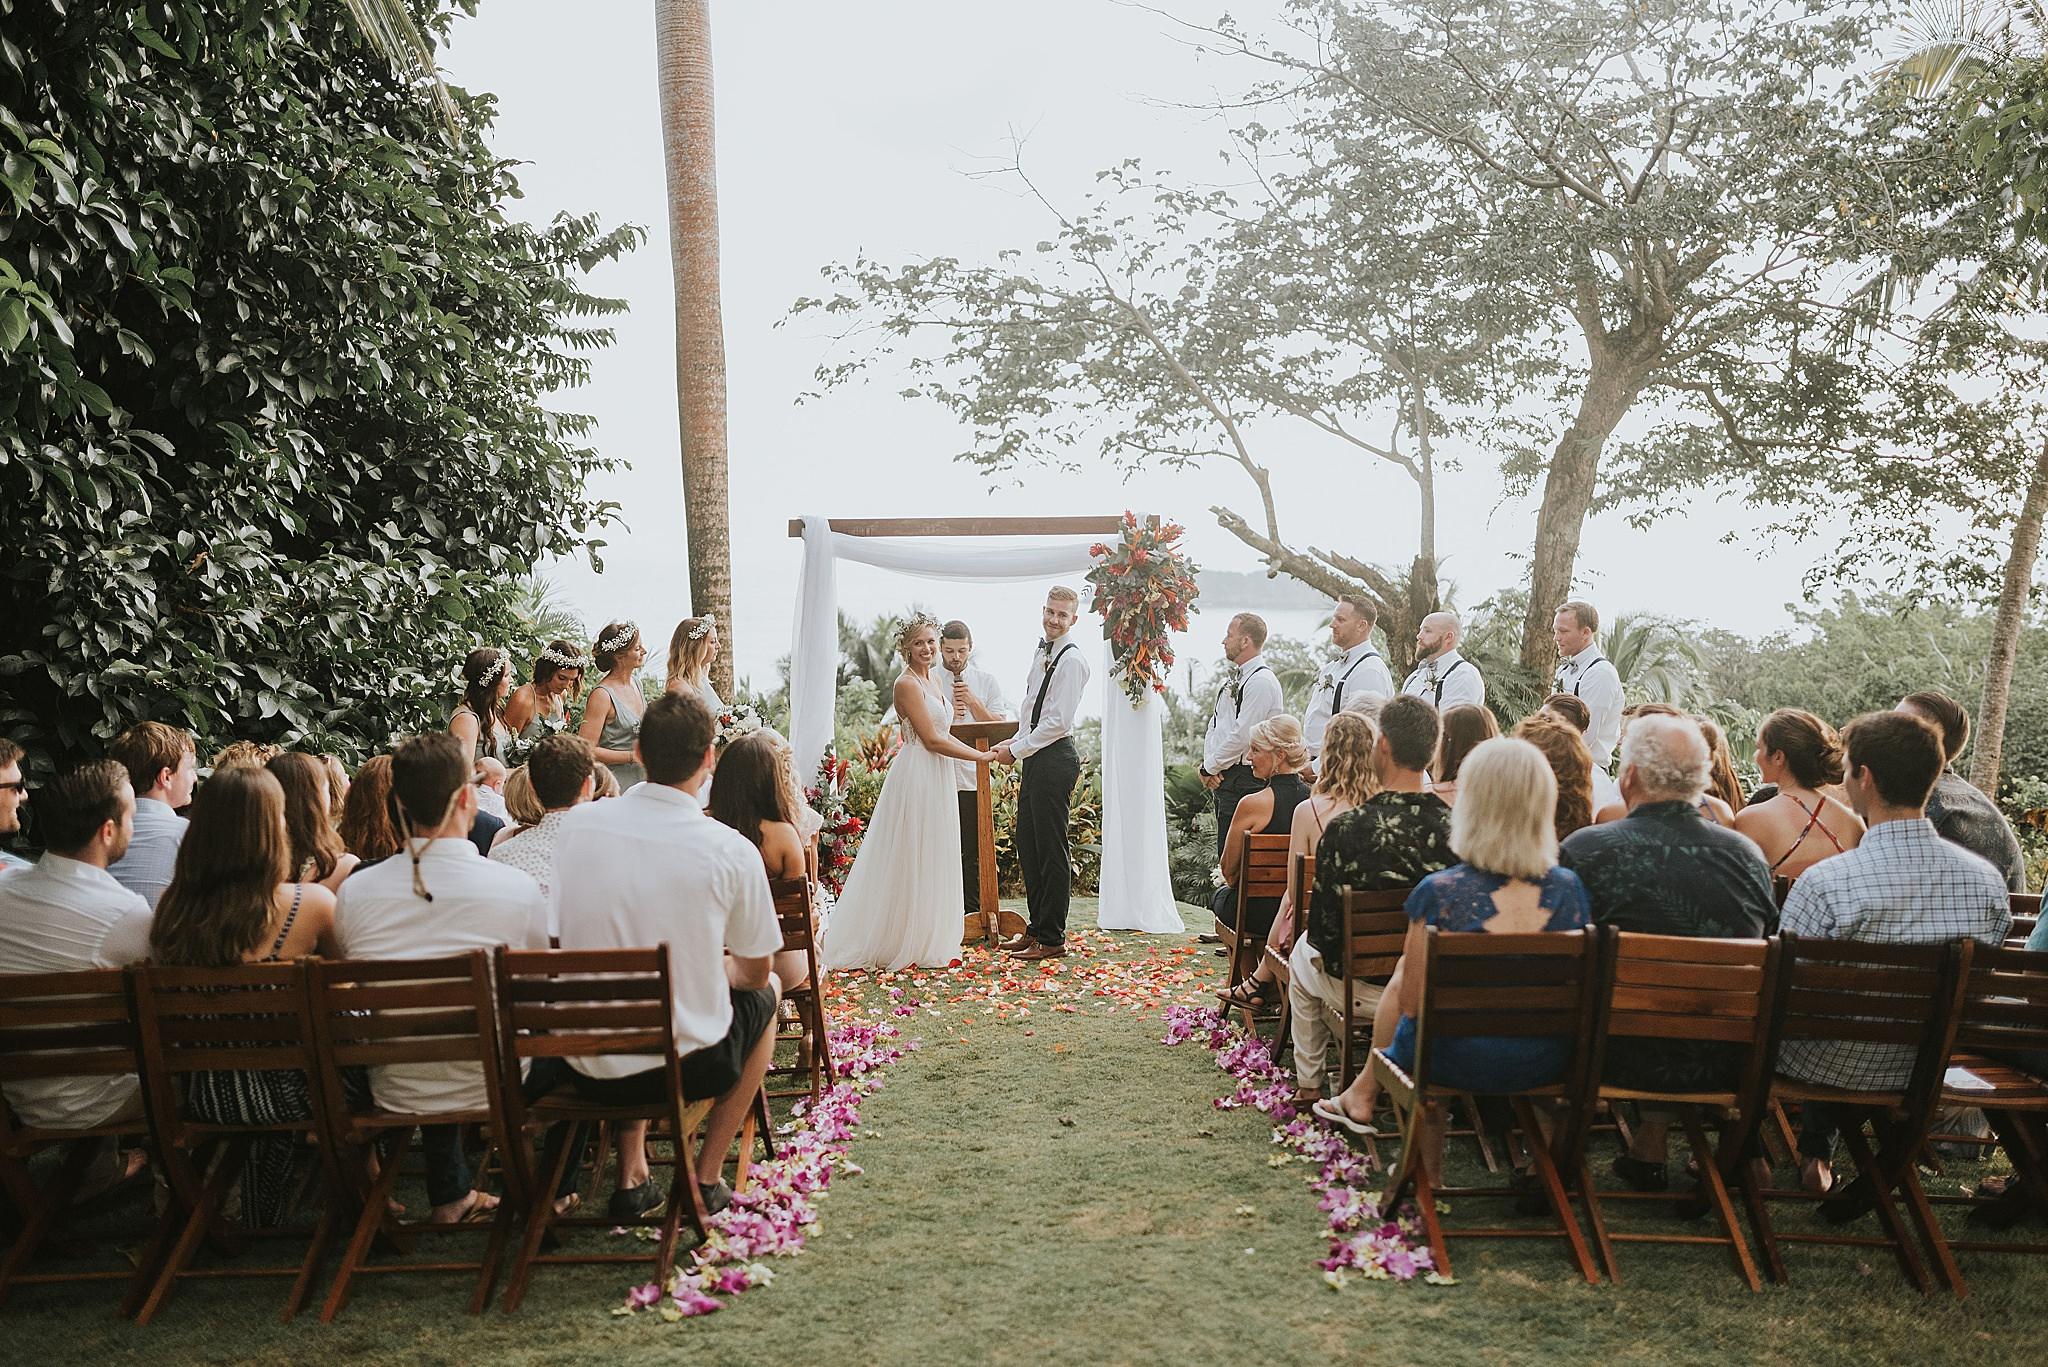 54Kelsey_jacob_beach_wedding_costa_rica_photography_0054.jpg